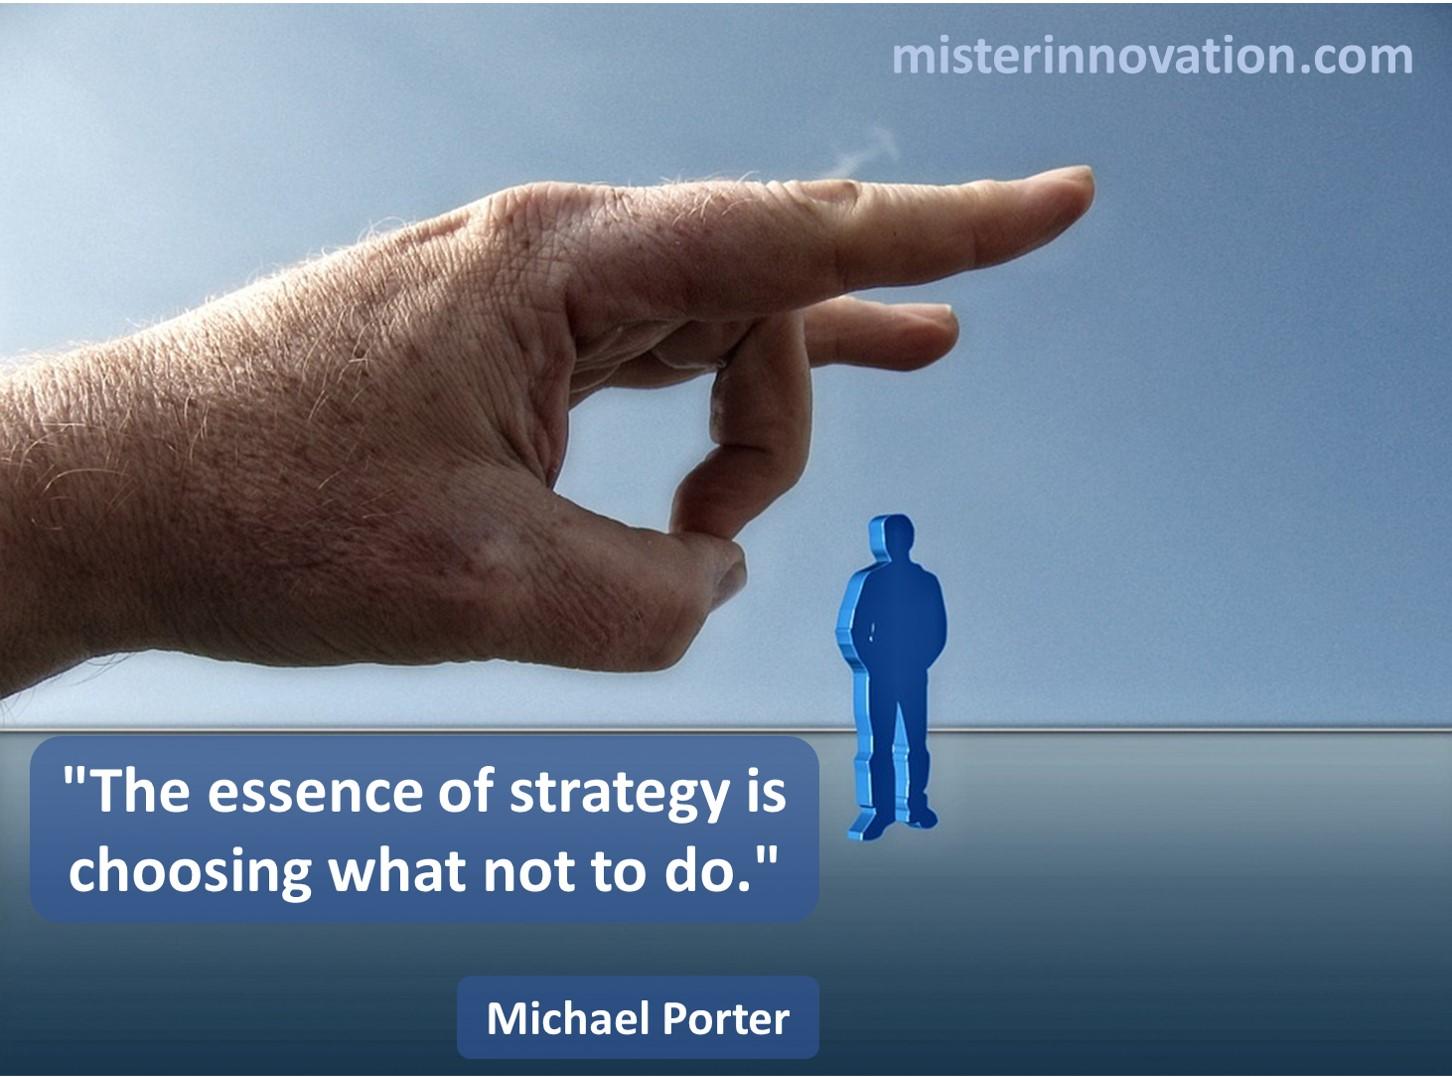 Michael Porter Choose Not to Do